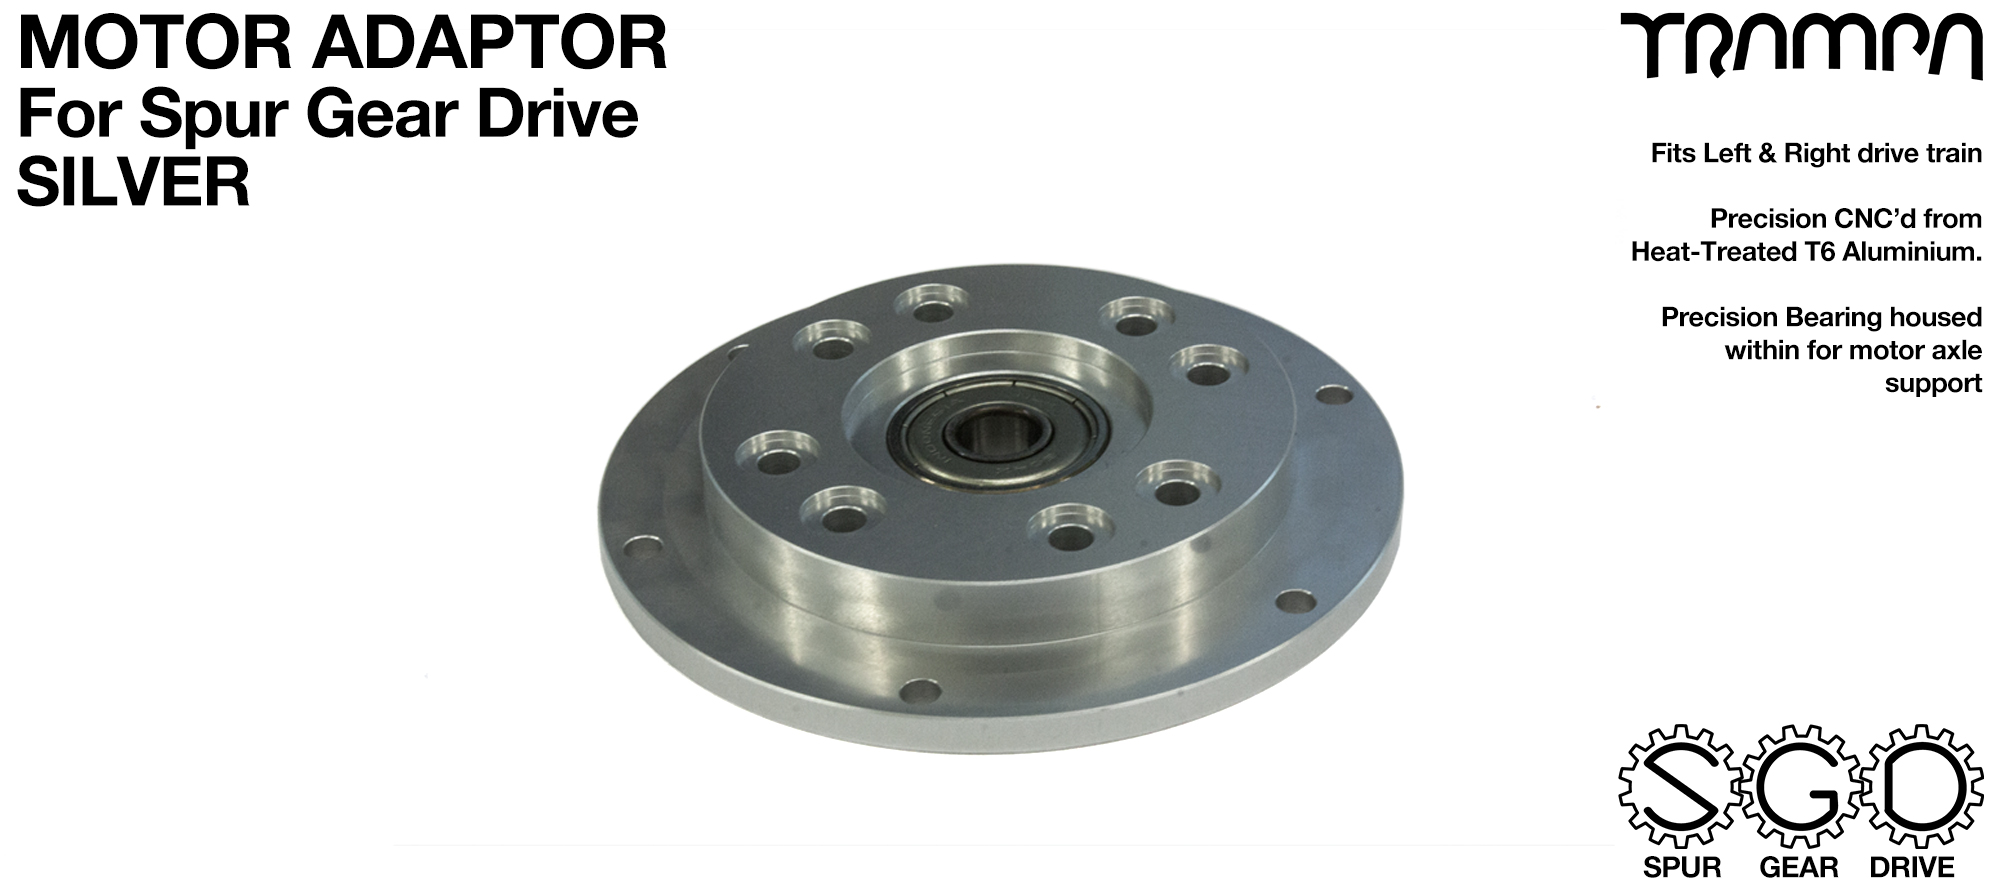 Spur Gear Drive Motor mount Adaptor